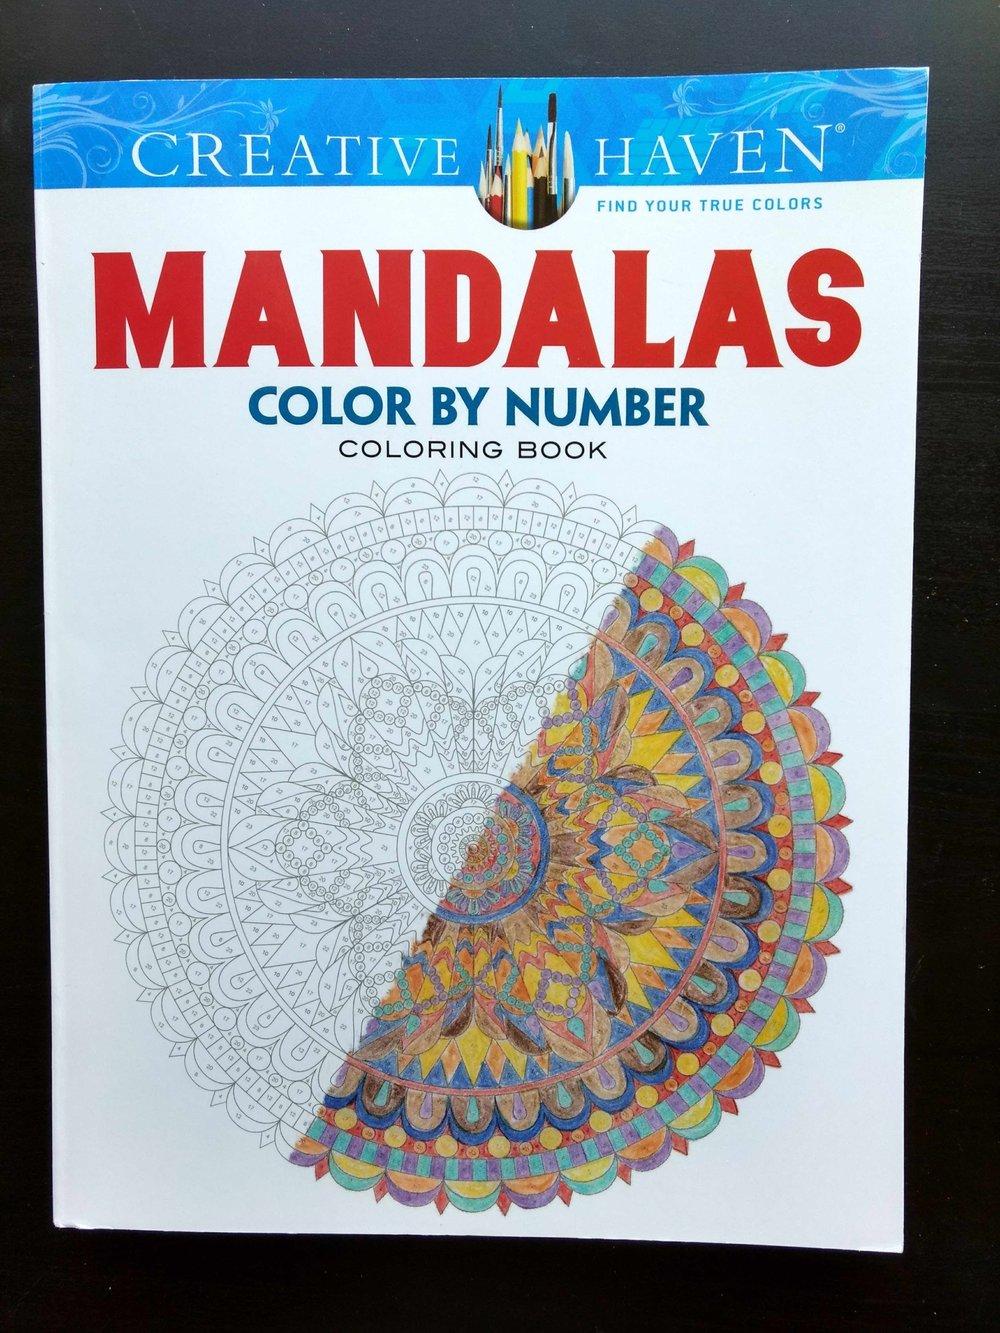 Creative Haven Mandalas.jpeg